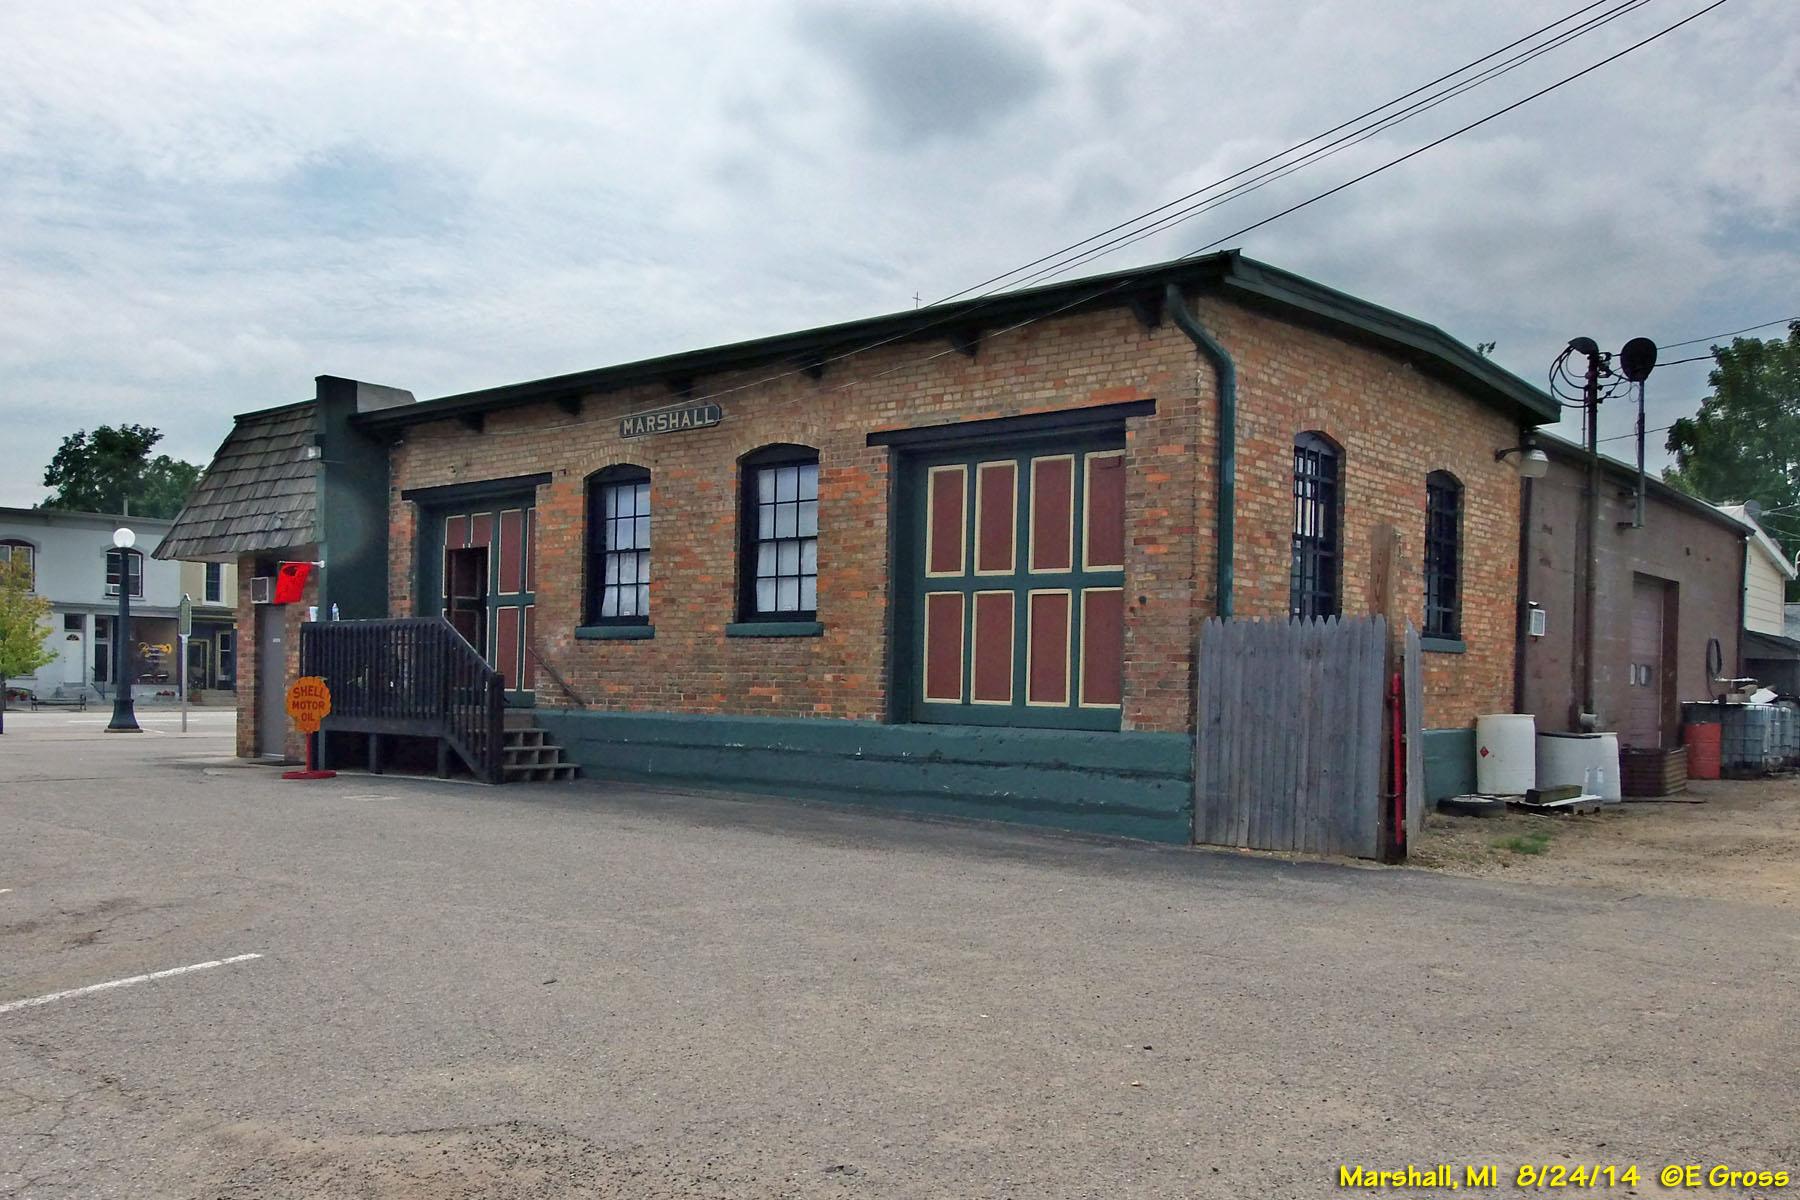 Interurban Railroads